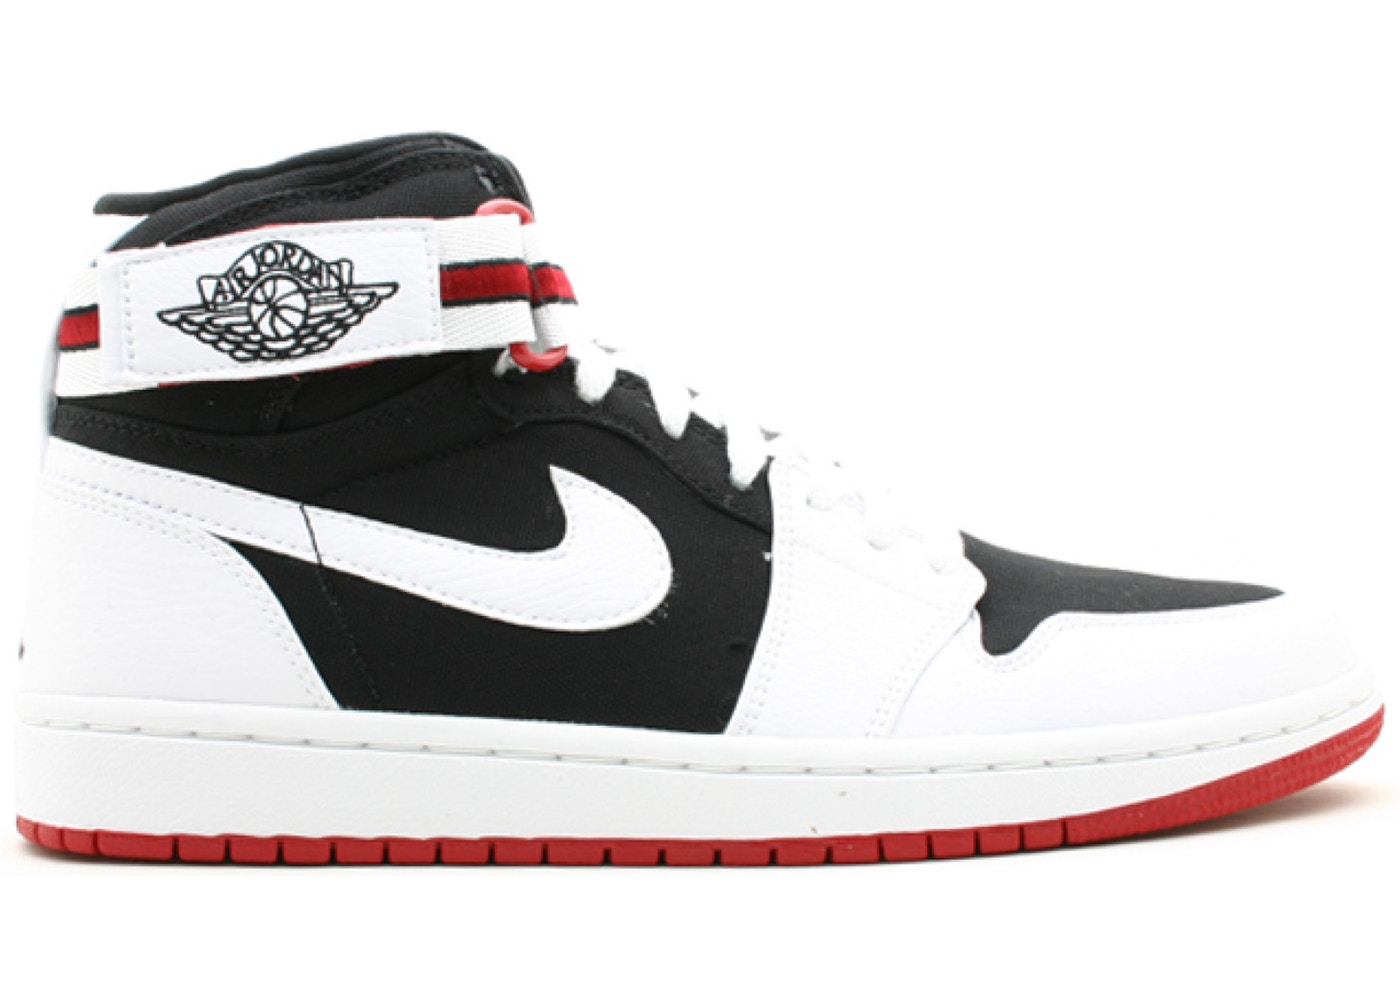 5343937b3d49 Jordan 1 Retro High Strap White Black Varsity Red - 342132-101